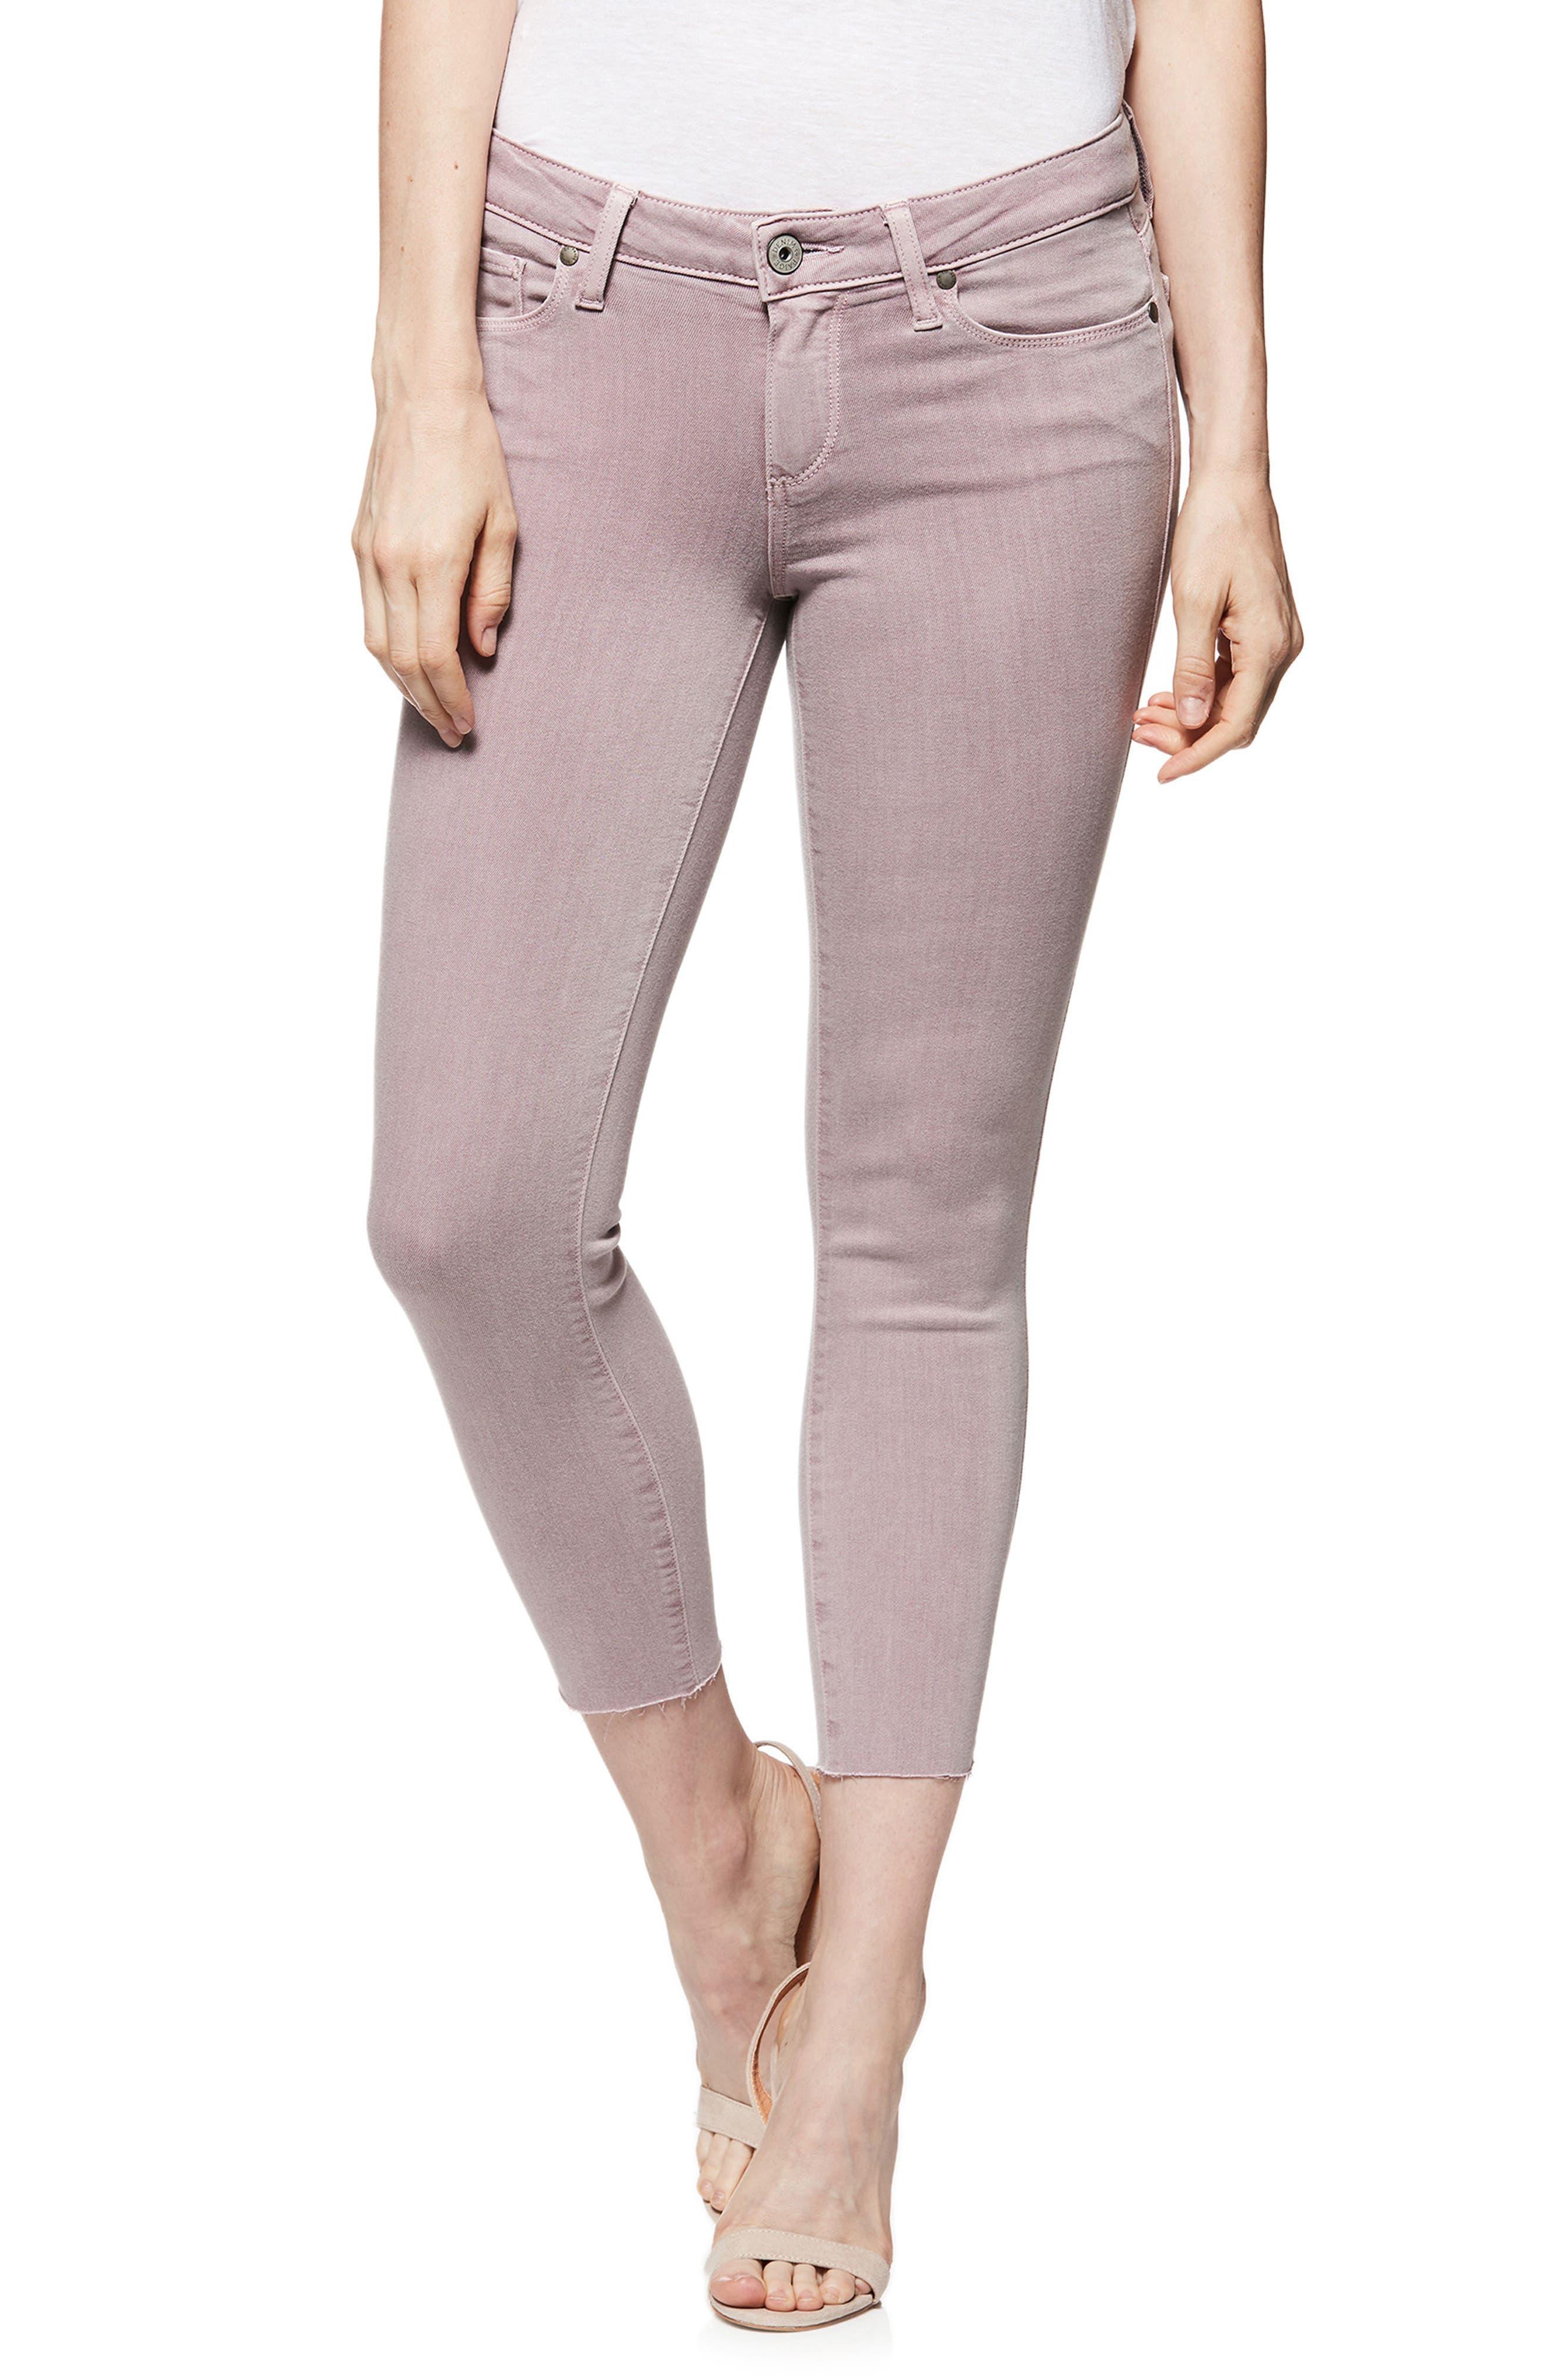 Transcend - Verdugo Raw Hem Crop Skinny Jeans,                             Main thumbnail 1, color,                             Vintage Lavendar Blooms